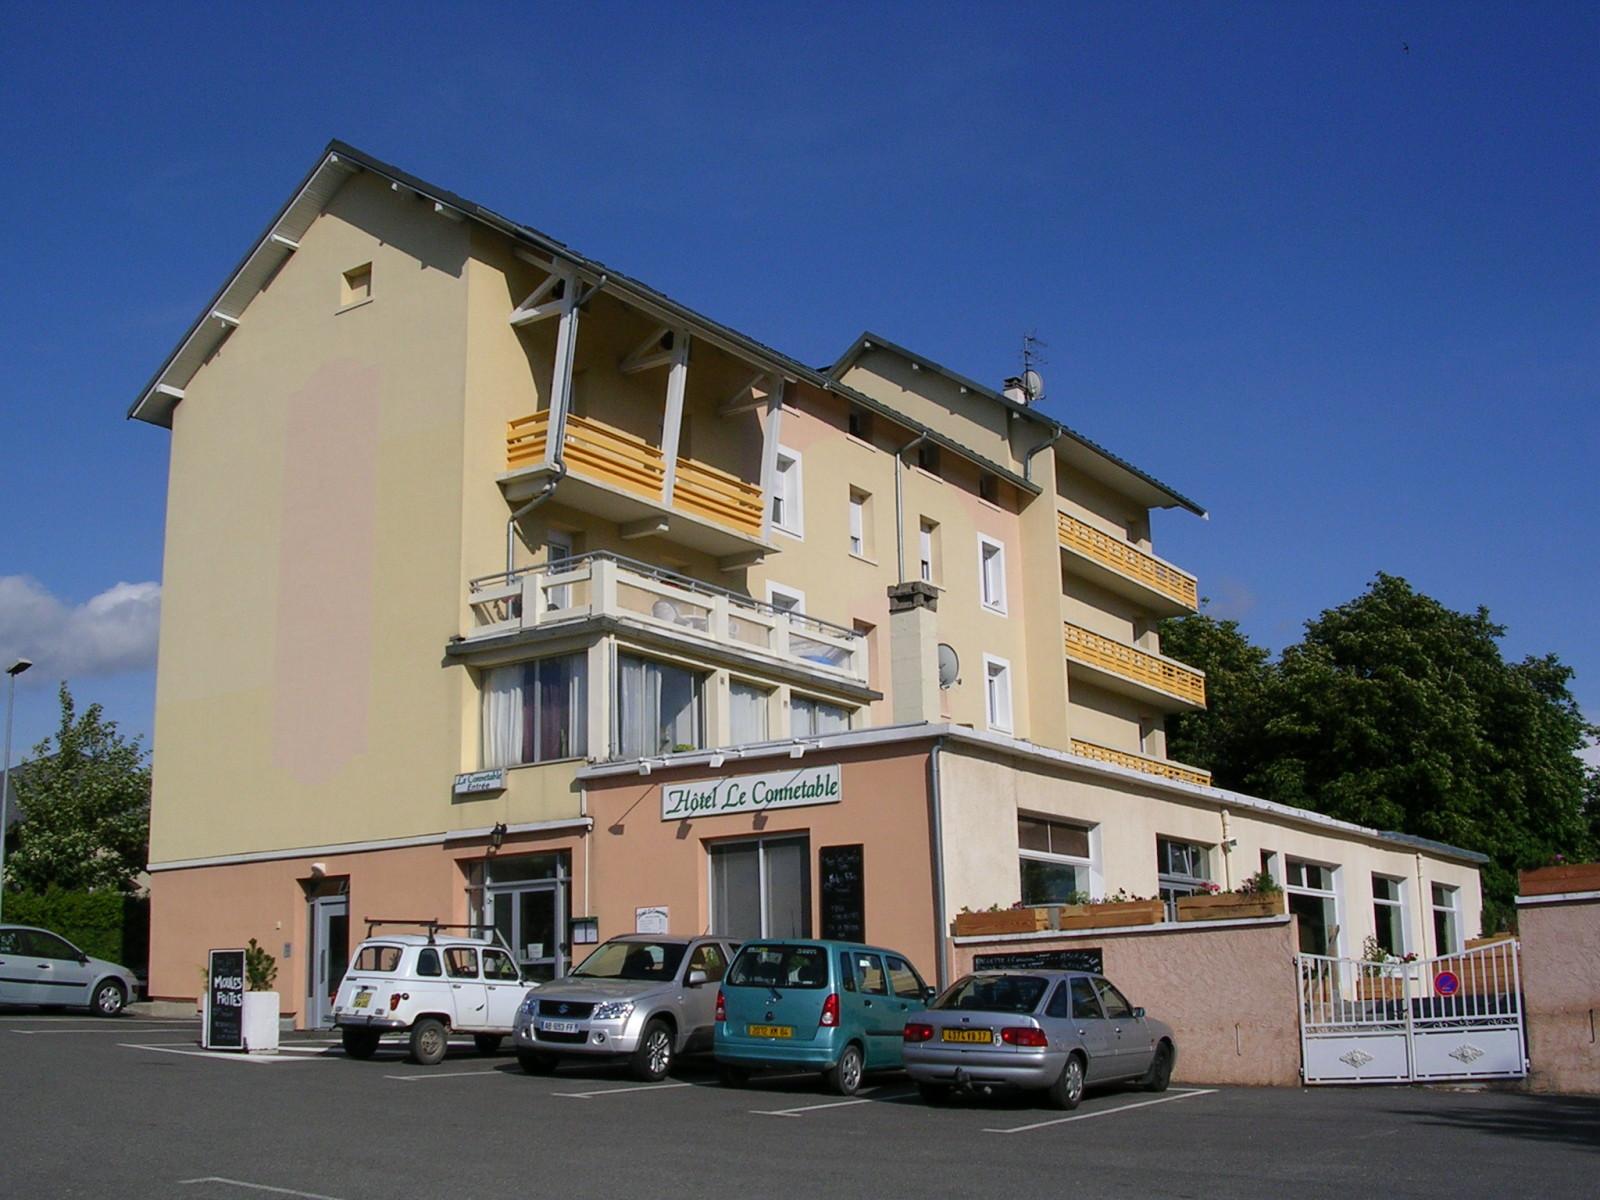 Saint-Bonnet-en-ChampsaurN3875.jpg